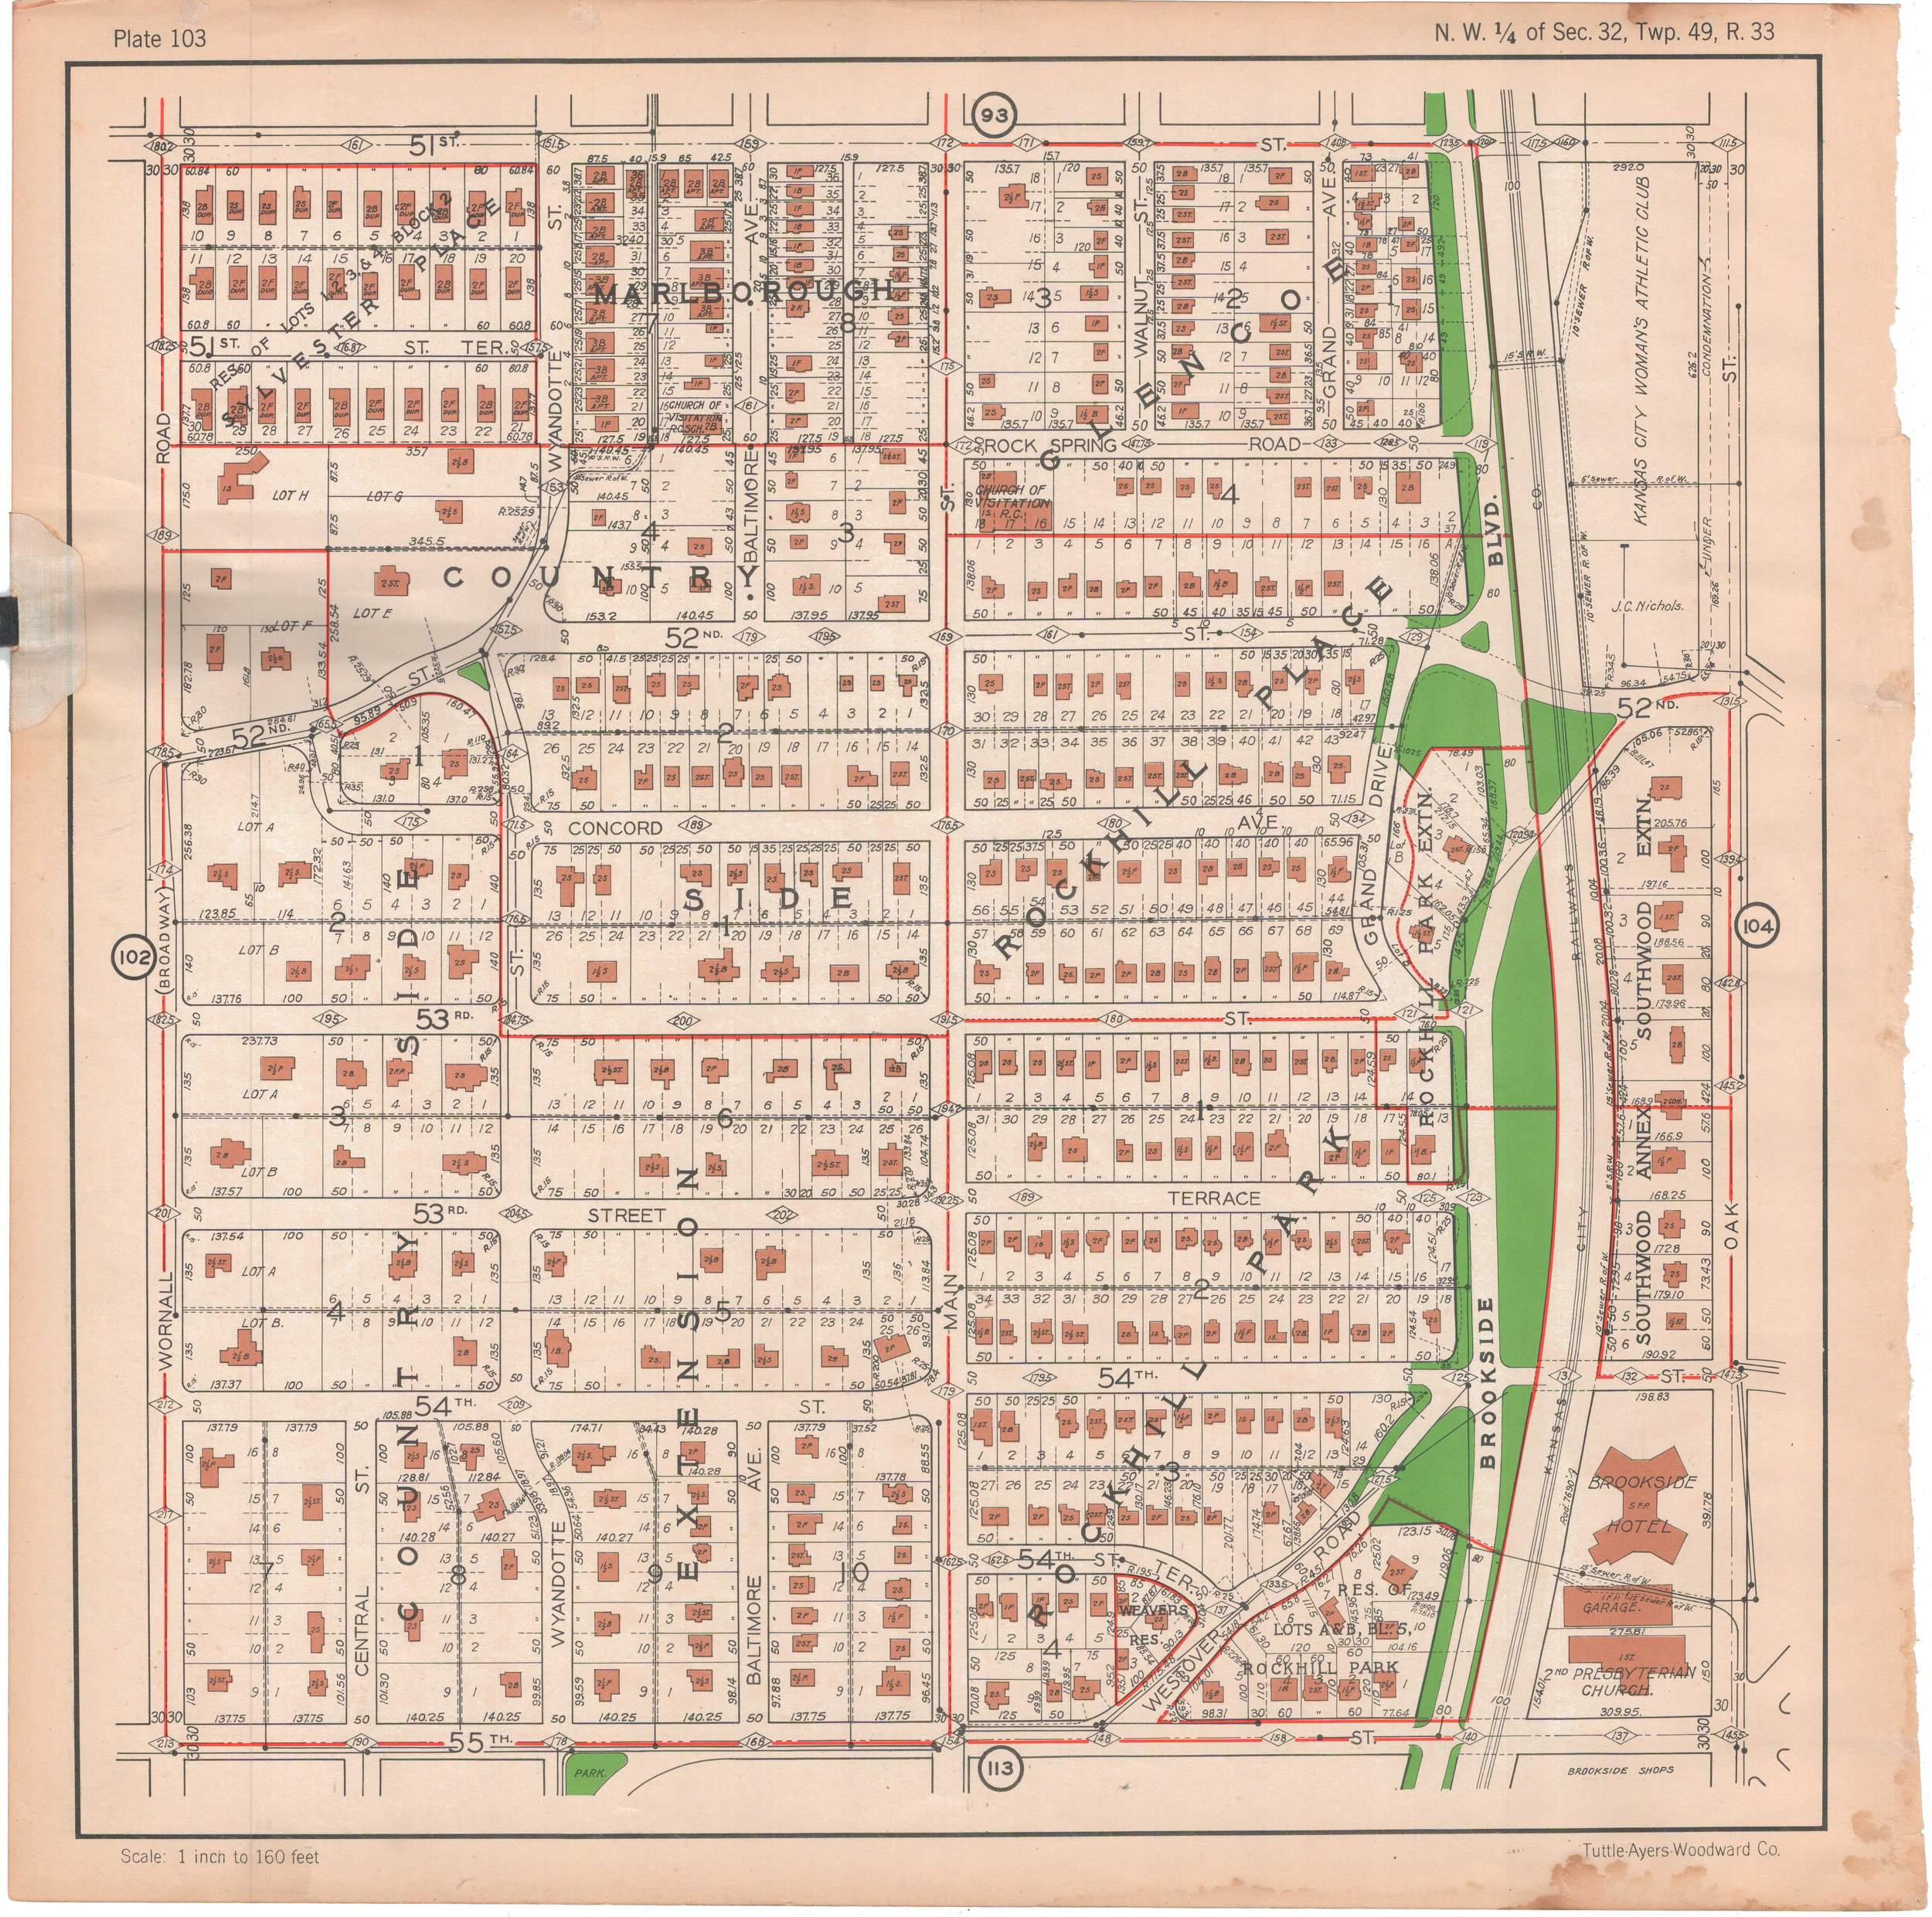 1925 TUTTLE_AYERS_Plate 103.JPG